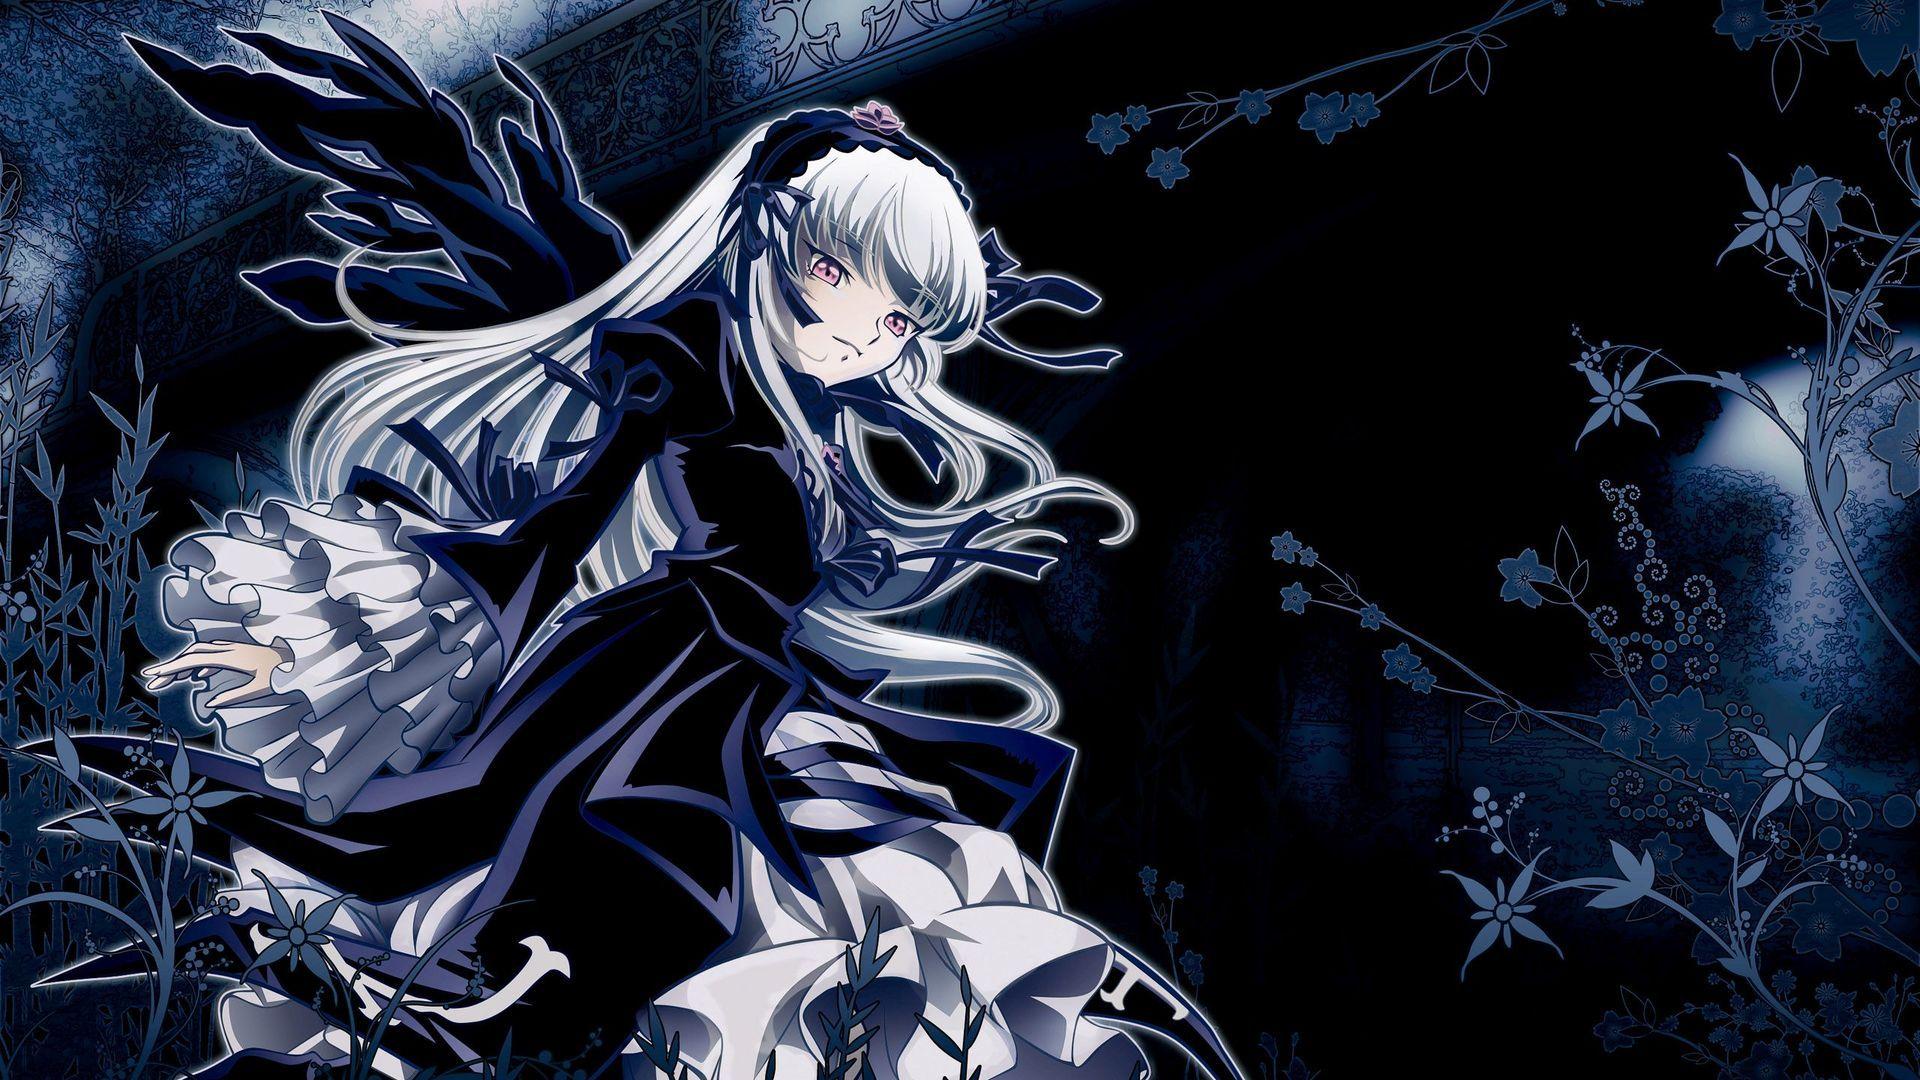 rosa mystica rozen maiden anime hd wallpaper 13605 - Anime ...